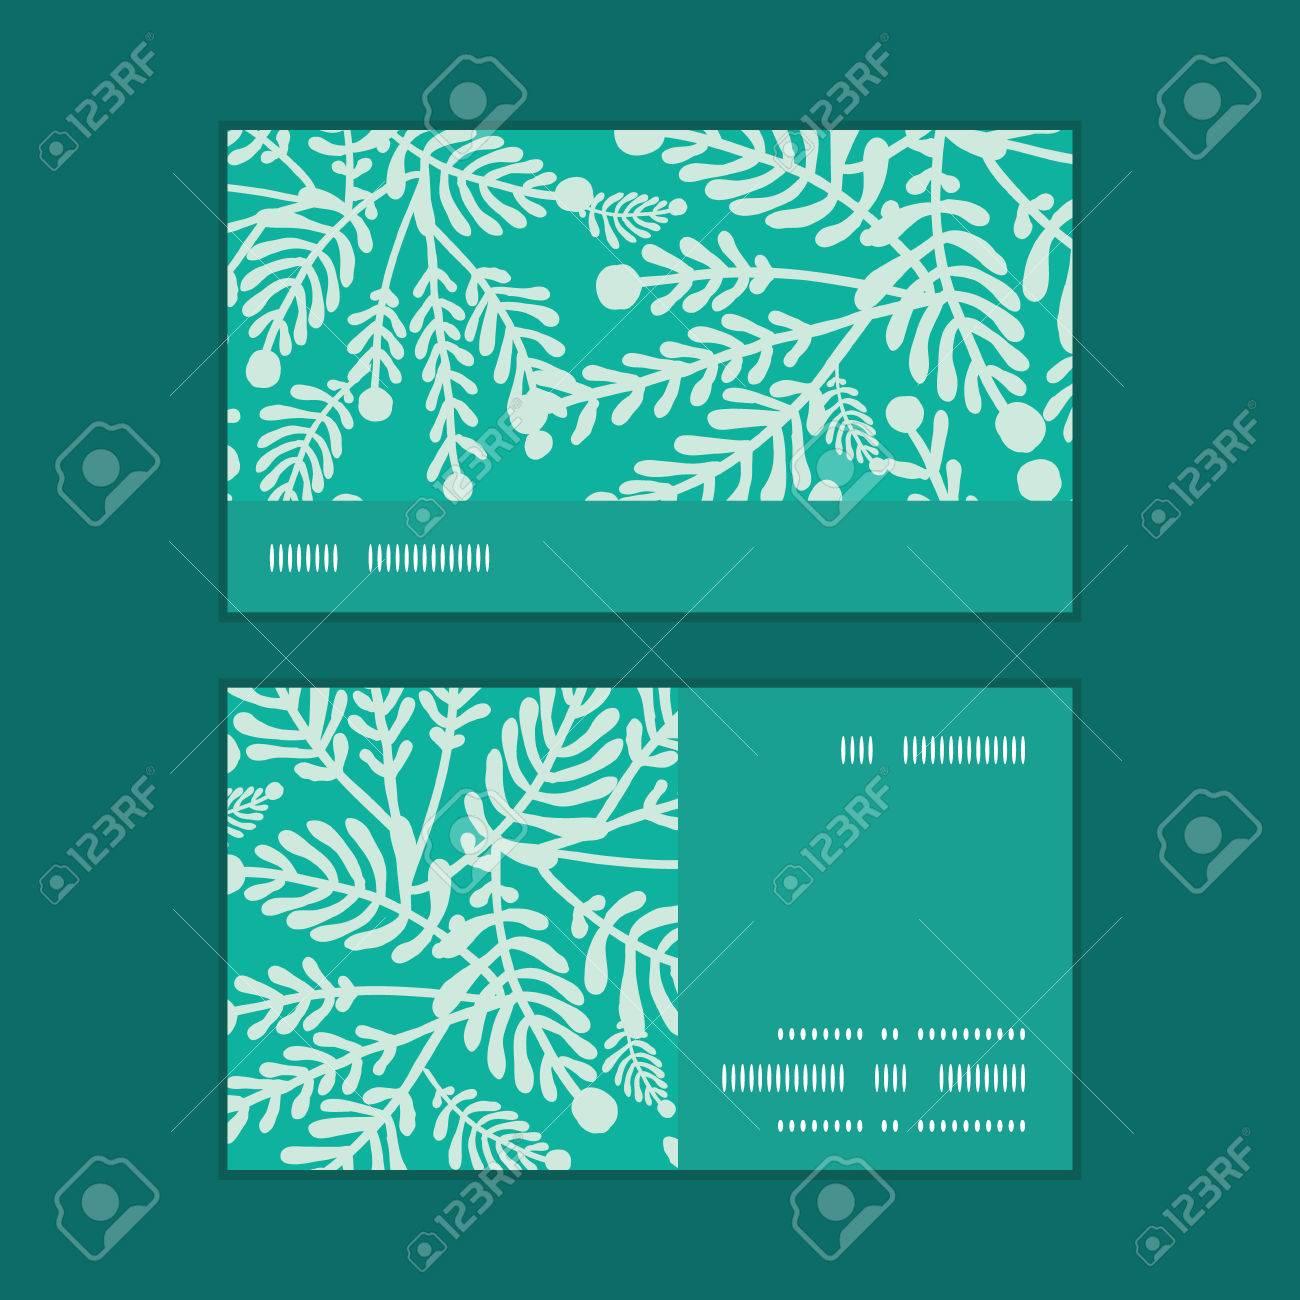 Vector Emeraude Plantes Vertes Bande Horizontale Motif Dencadrement